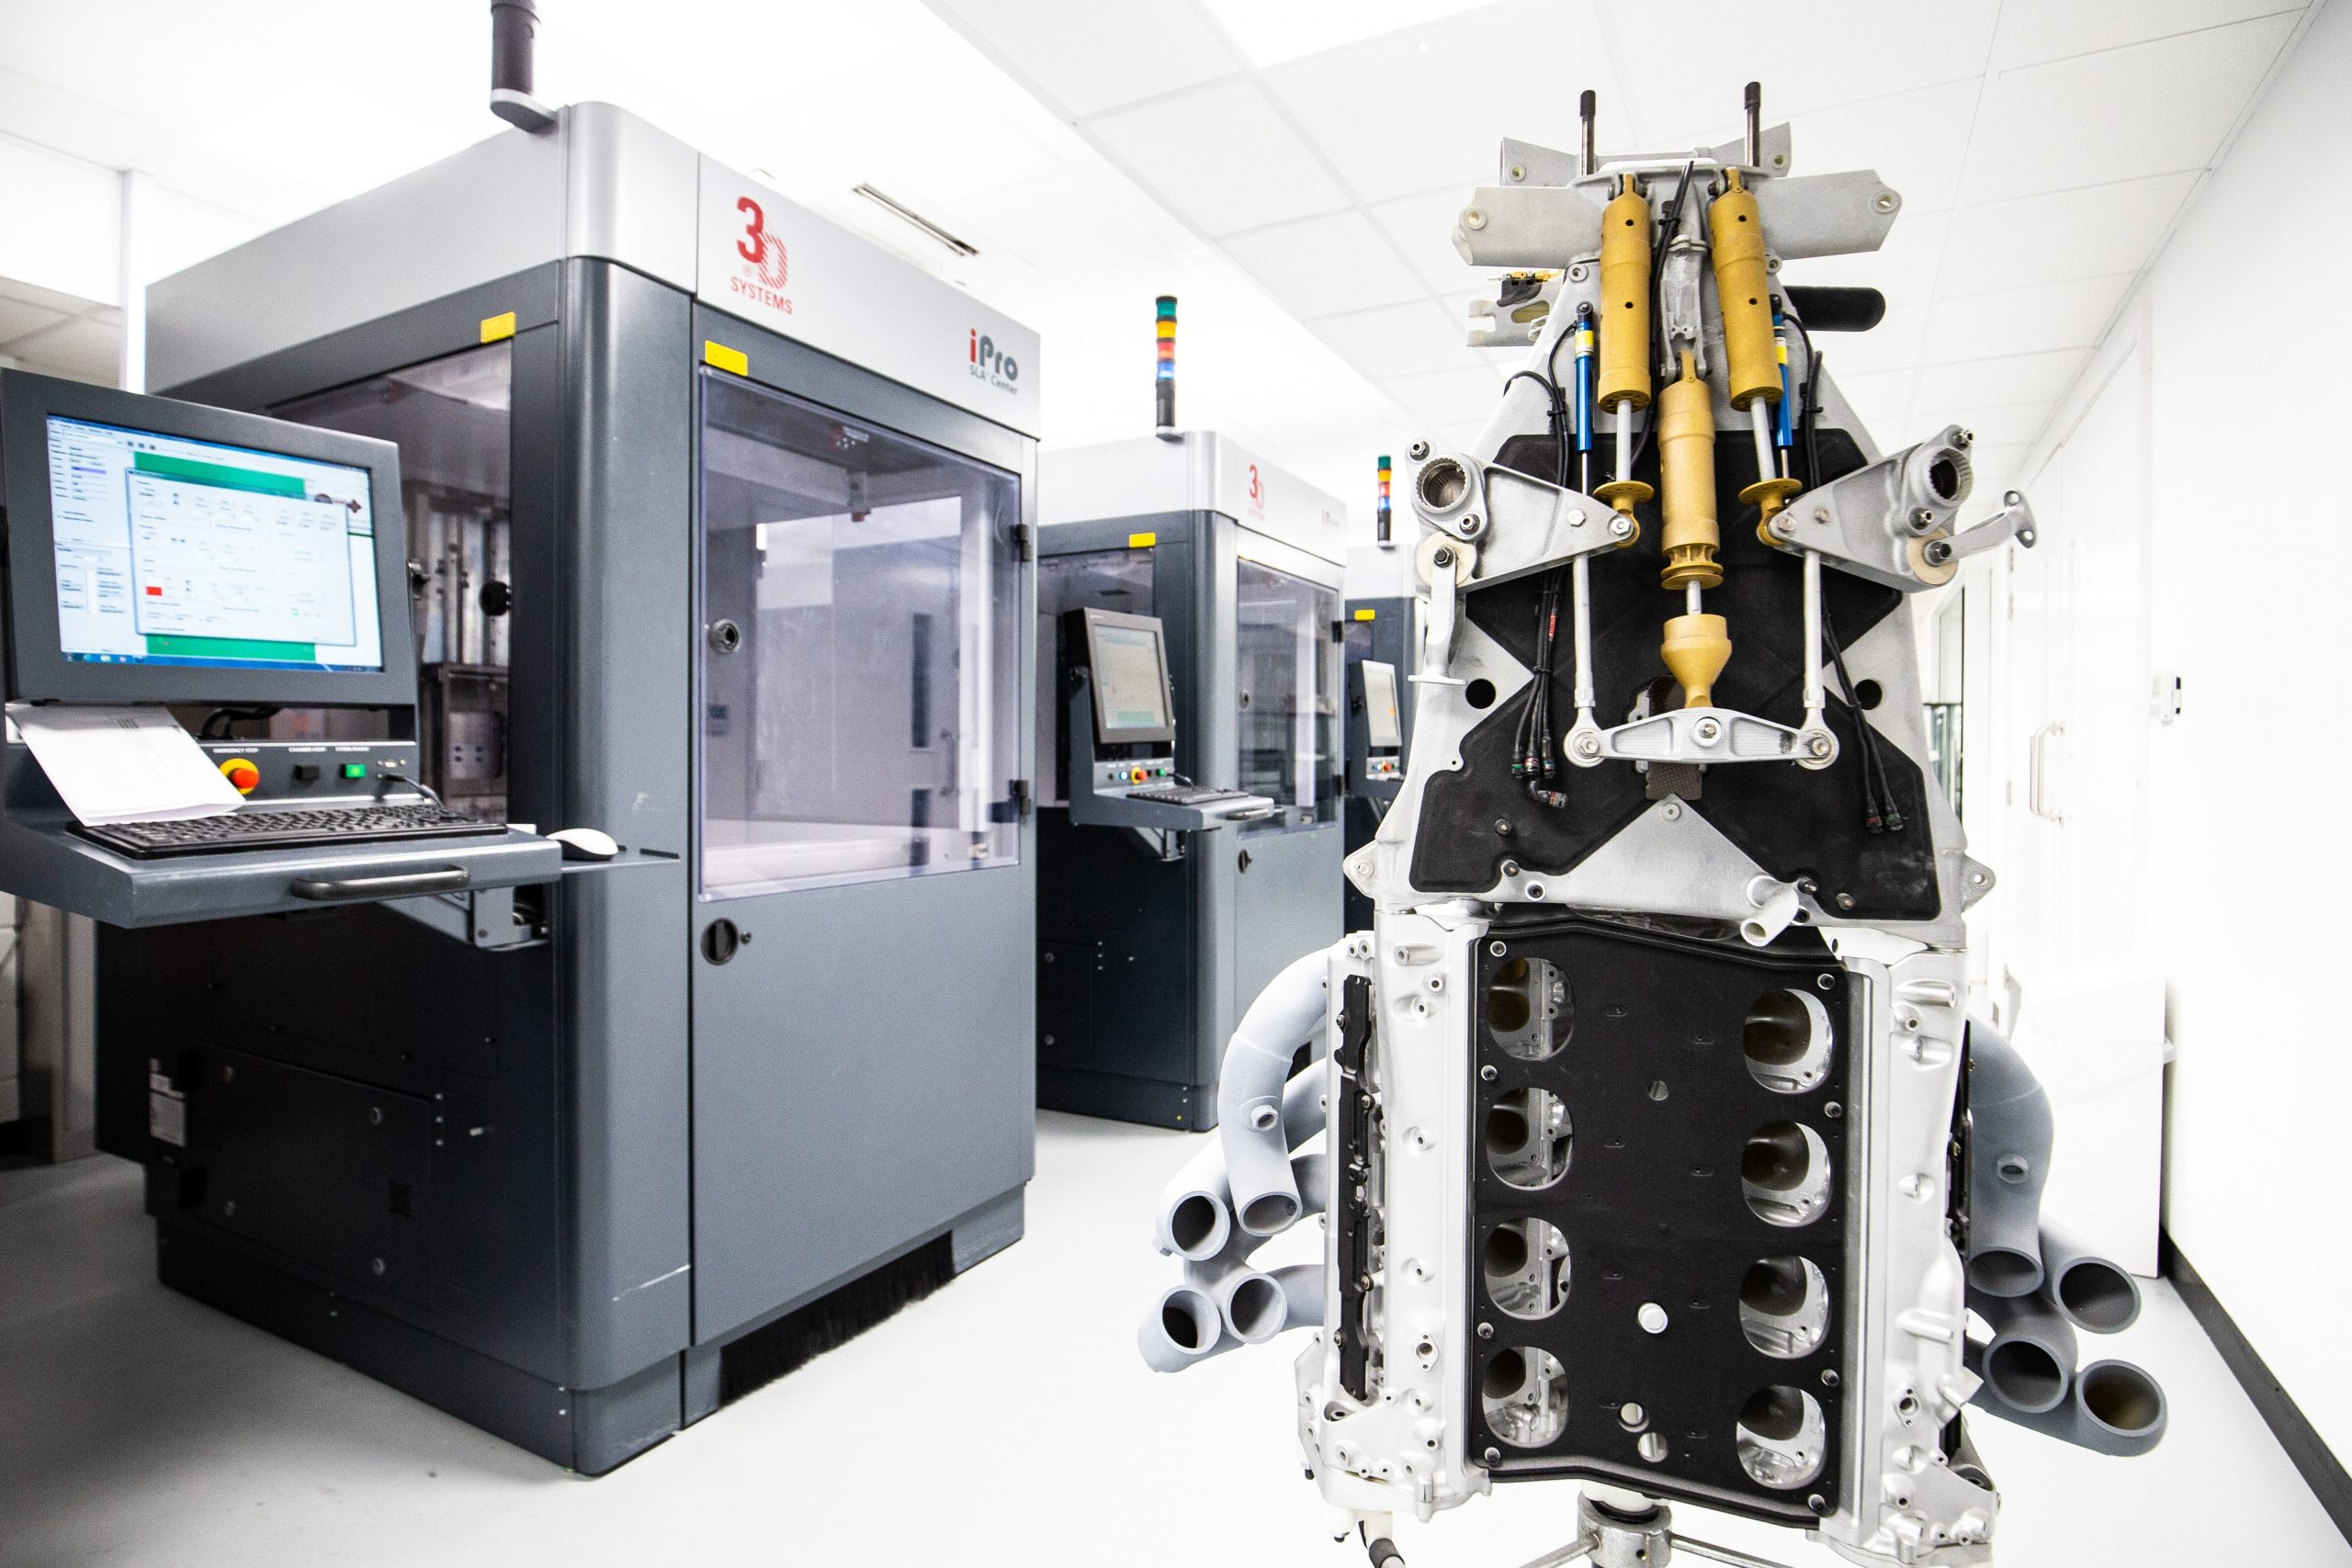 Renault Sport F1 Team Technical Centre - additive manufacturing. Renault Sport F1 Team Headquarters, Enstone, England. (Source: Renault DP World F1 Team)